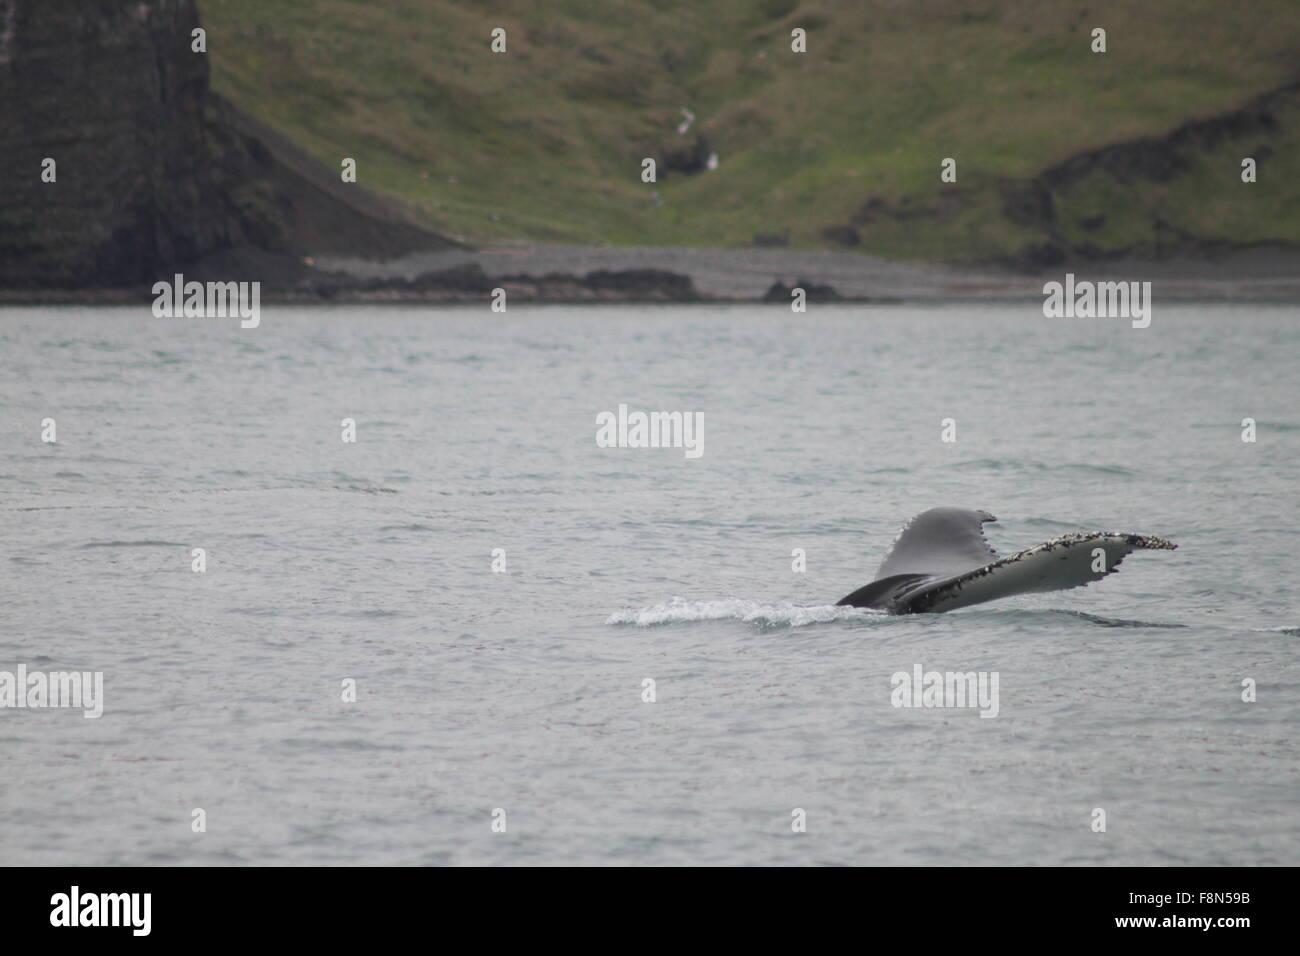 Ballena Jorobada bucear cerca de la orilla de la Bahía de Skjalfandi Husavik al nordeste de Islandia Europa Foto de stock